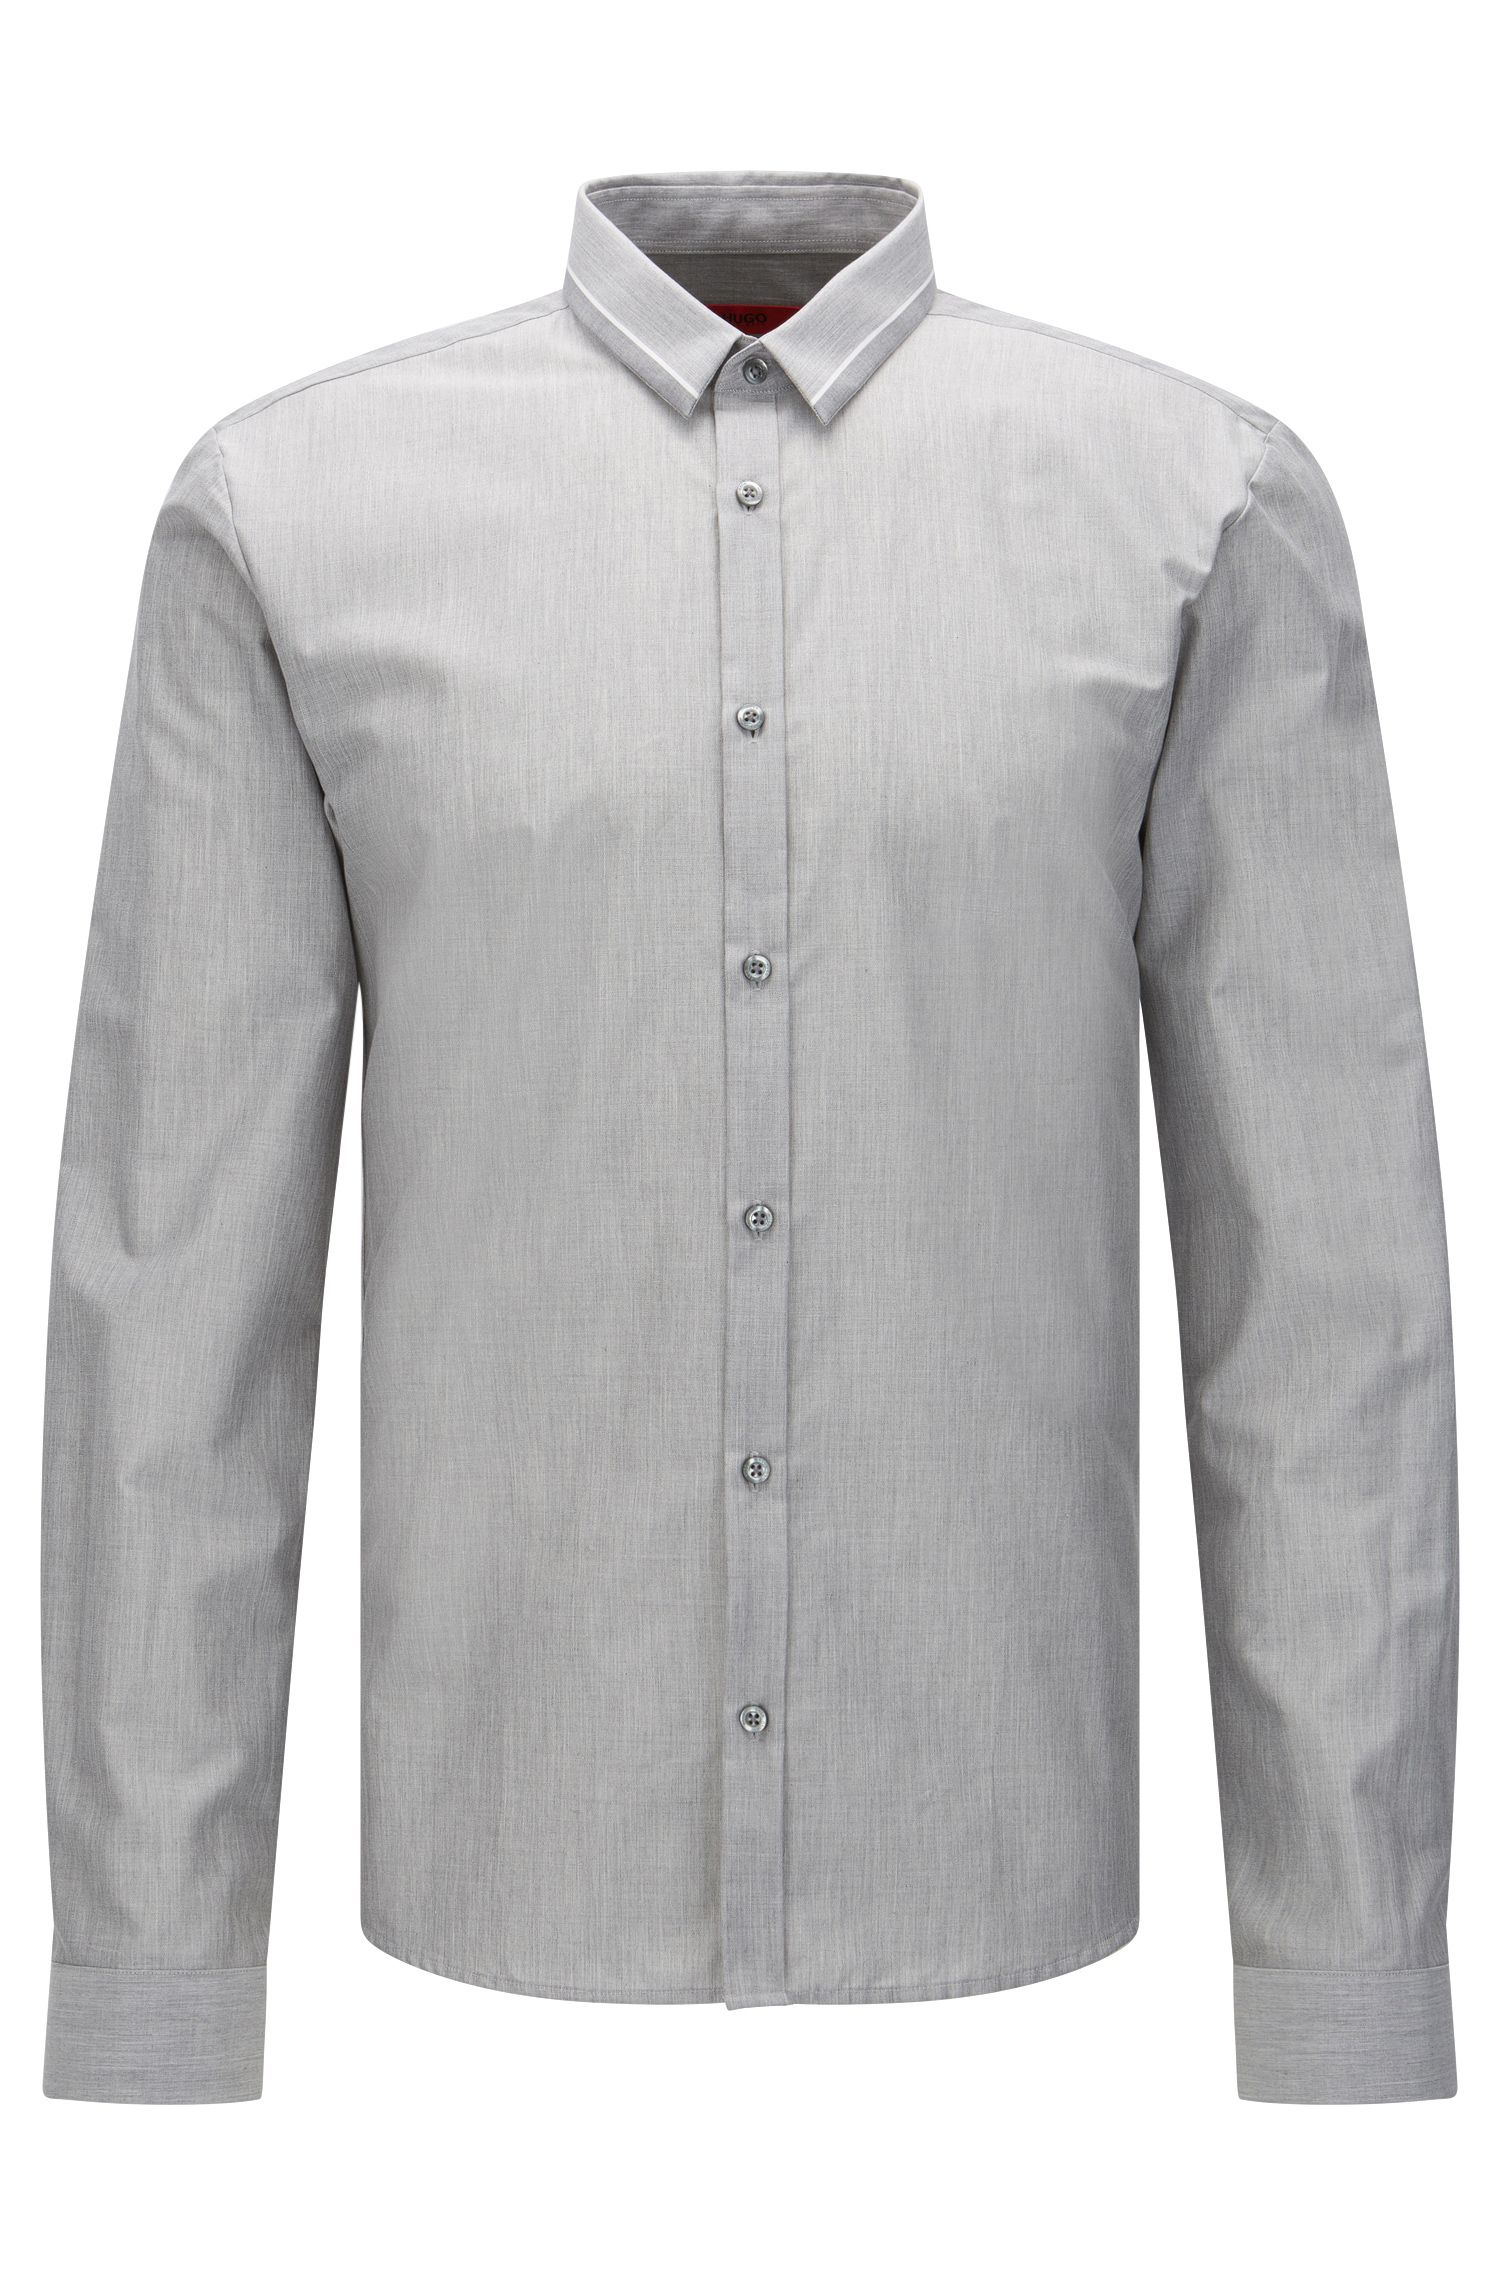 'Ero'   Slim Fit, Cotton Button Down Shirt